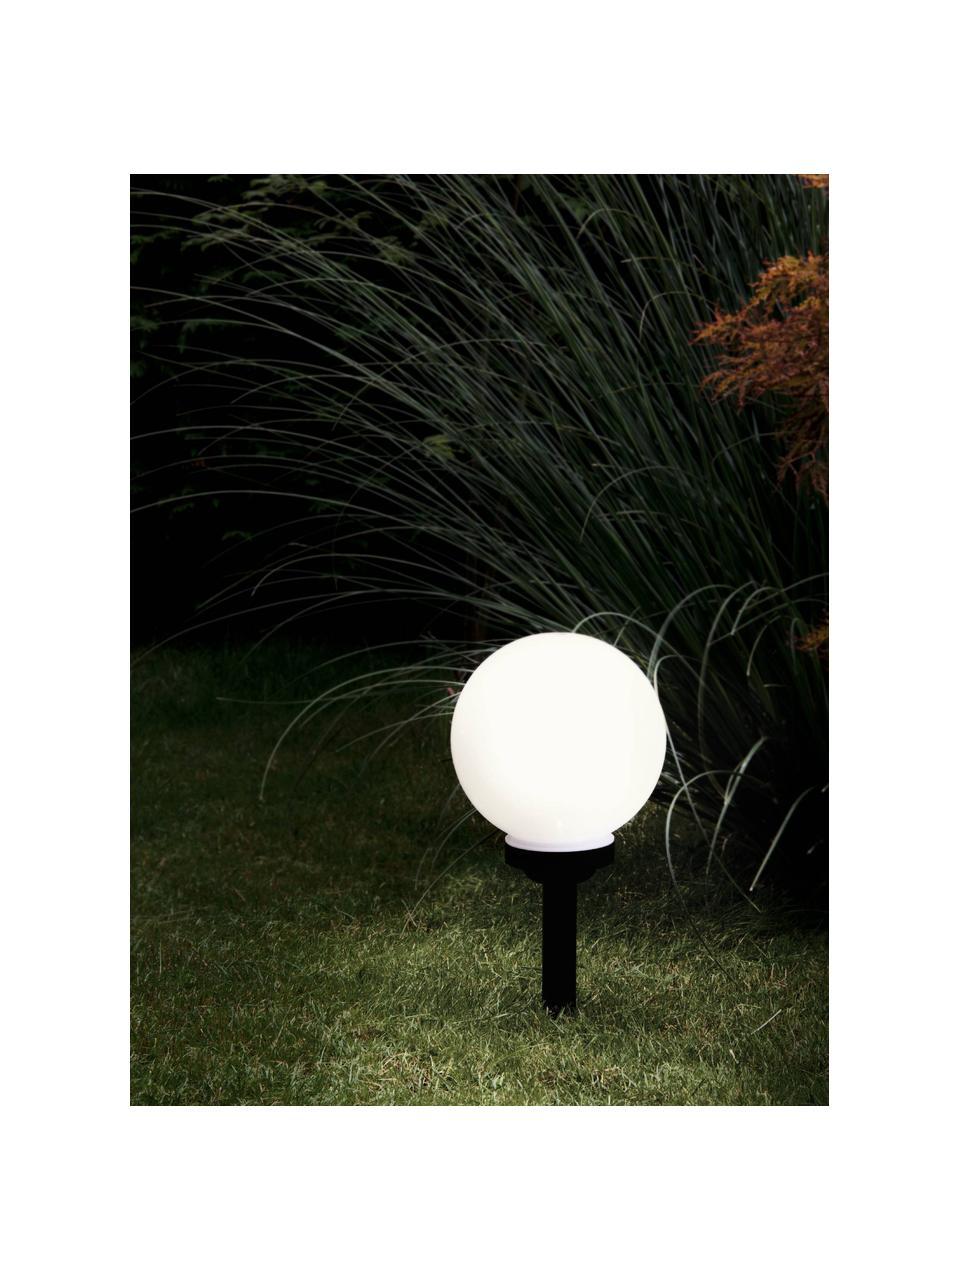 Lampada da terra solare Zindy, Paralume: materiale sintetico, Nero, bianco, Ø 20 x Alt. 40 cm